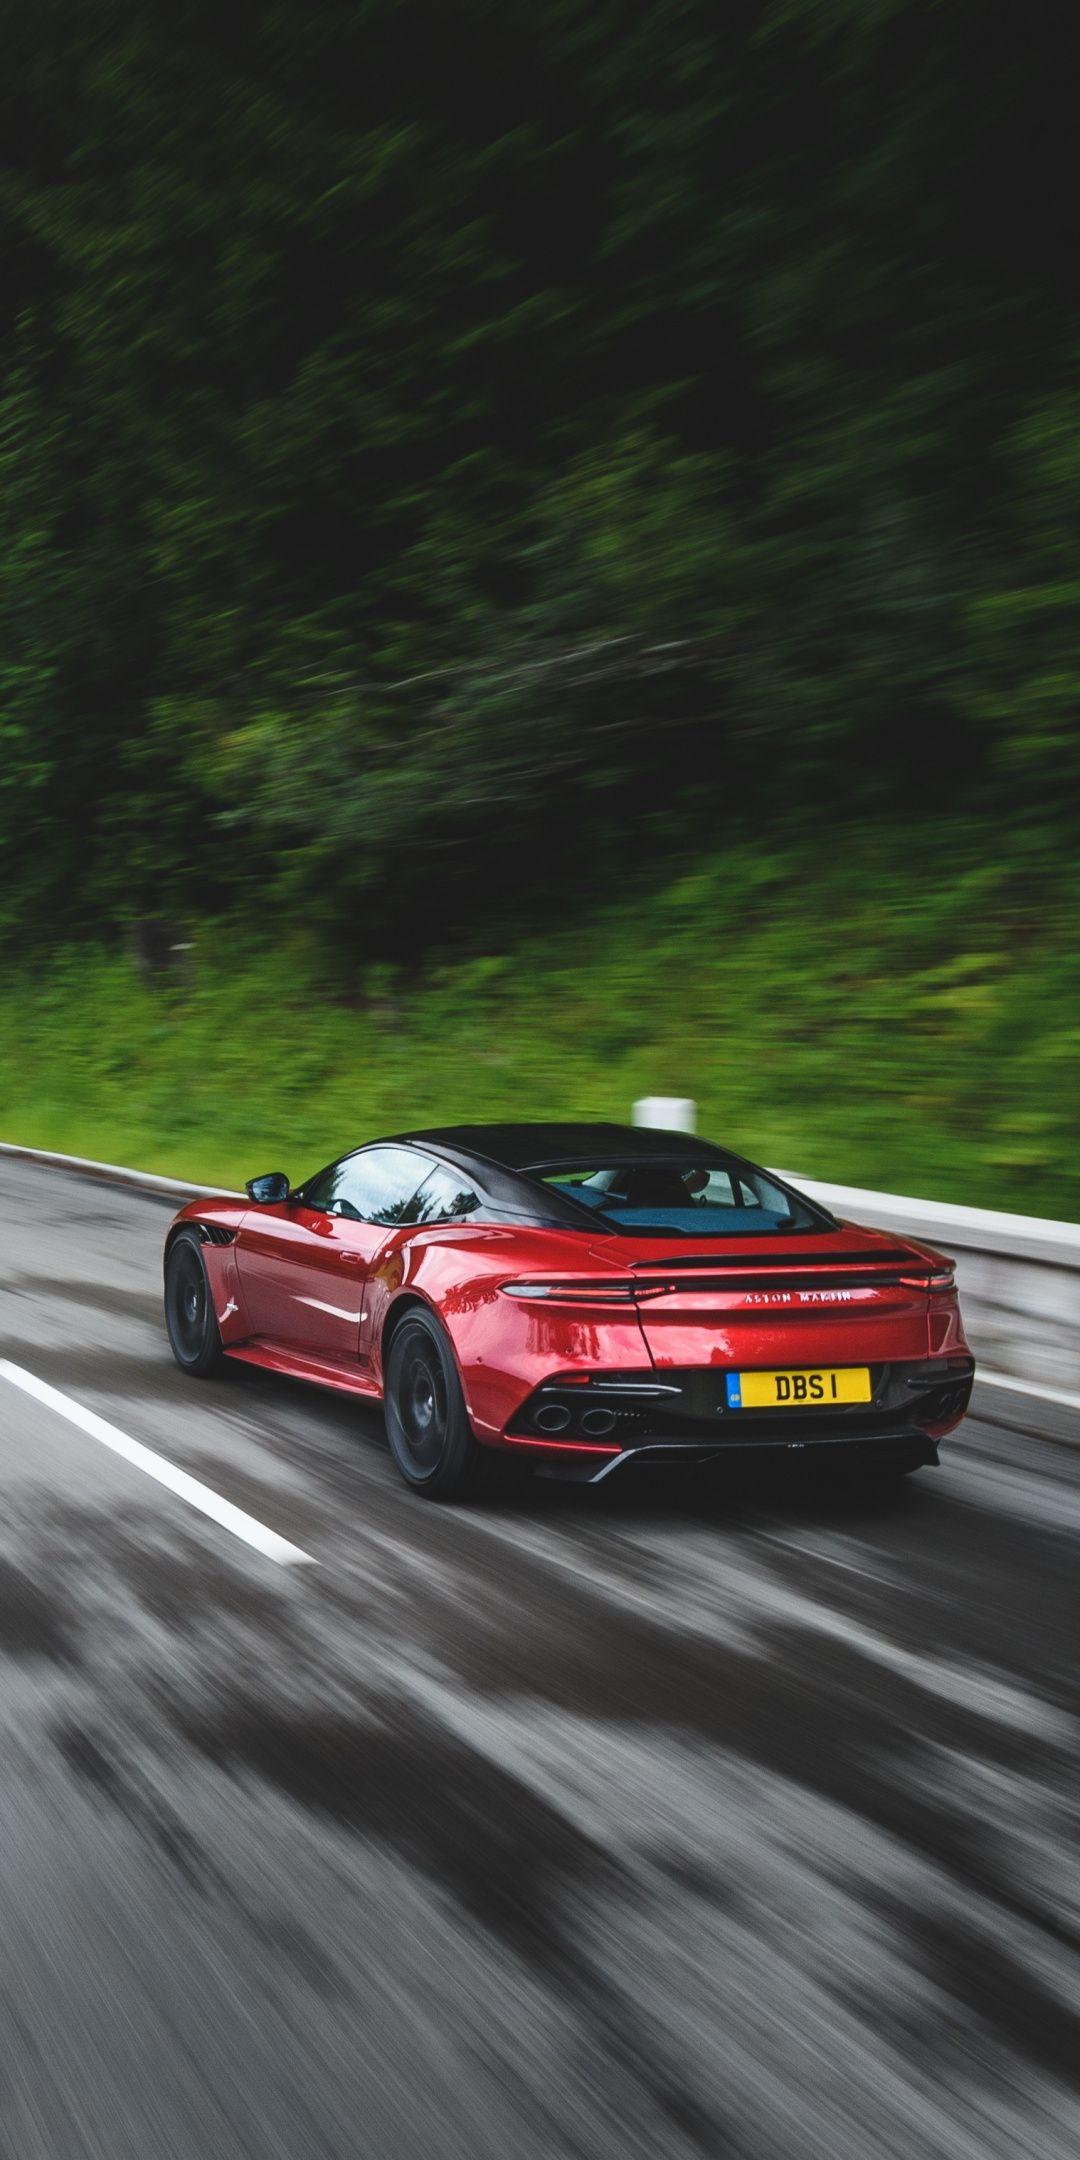 Rear View Aston Martin Dbs Superleggera On Road 1080x2160 Wallpaper Aston Martin Dbs Aston Martin Dbs Superleggera Aston Martin Cars